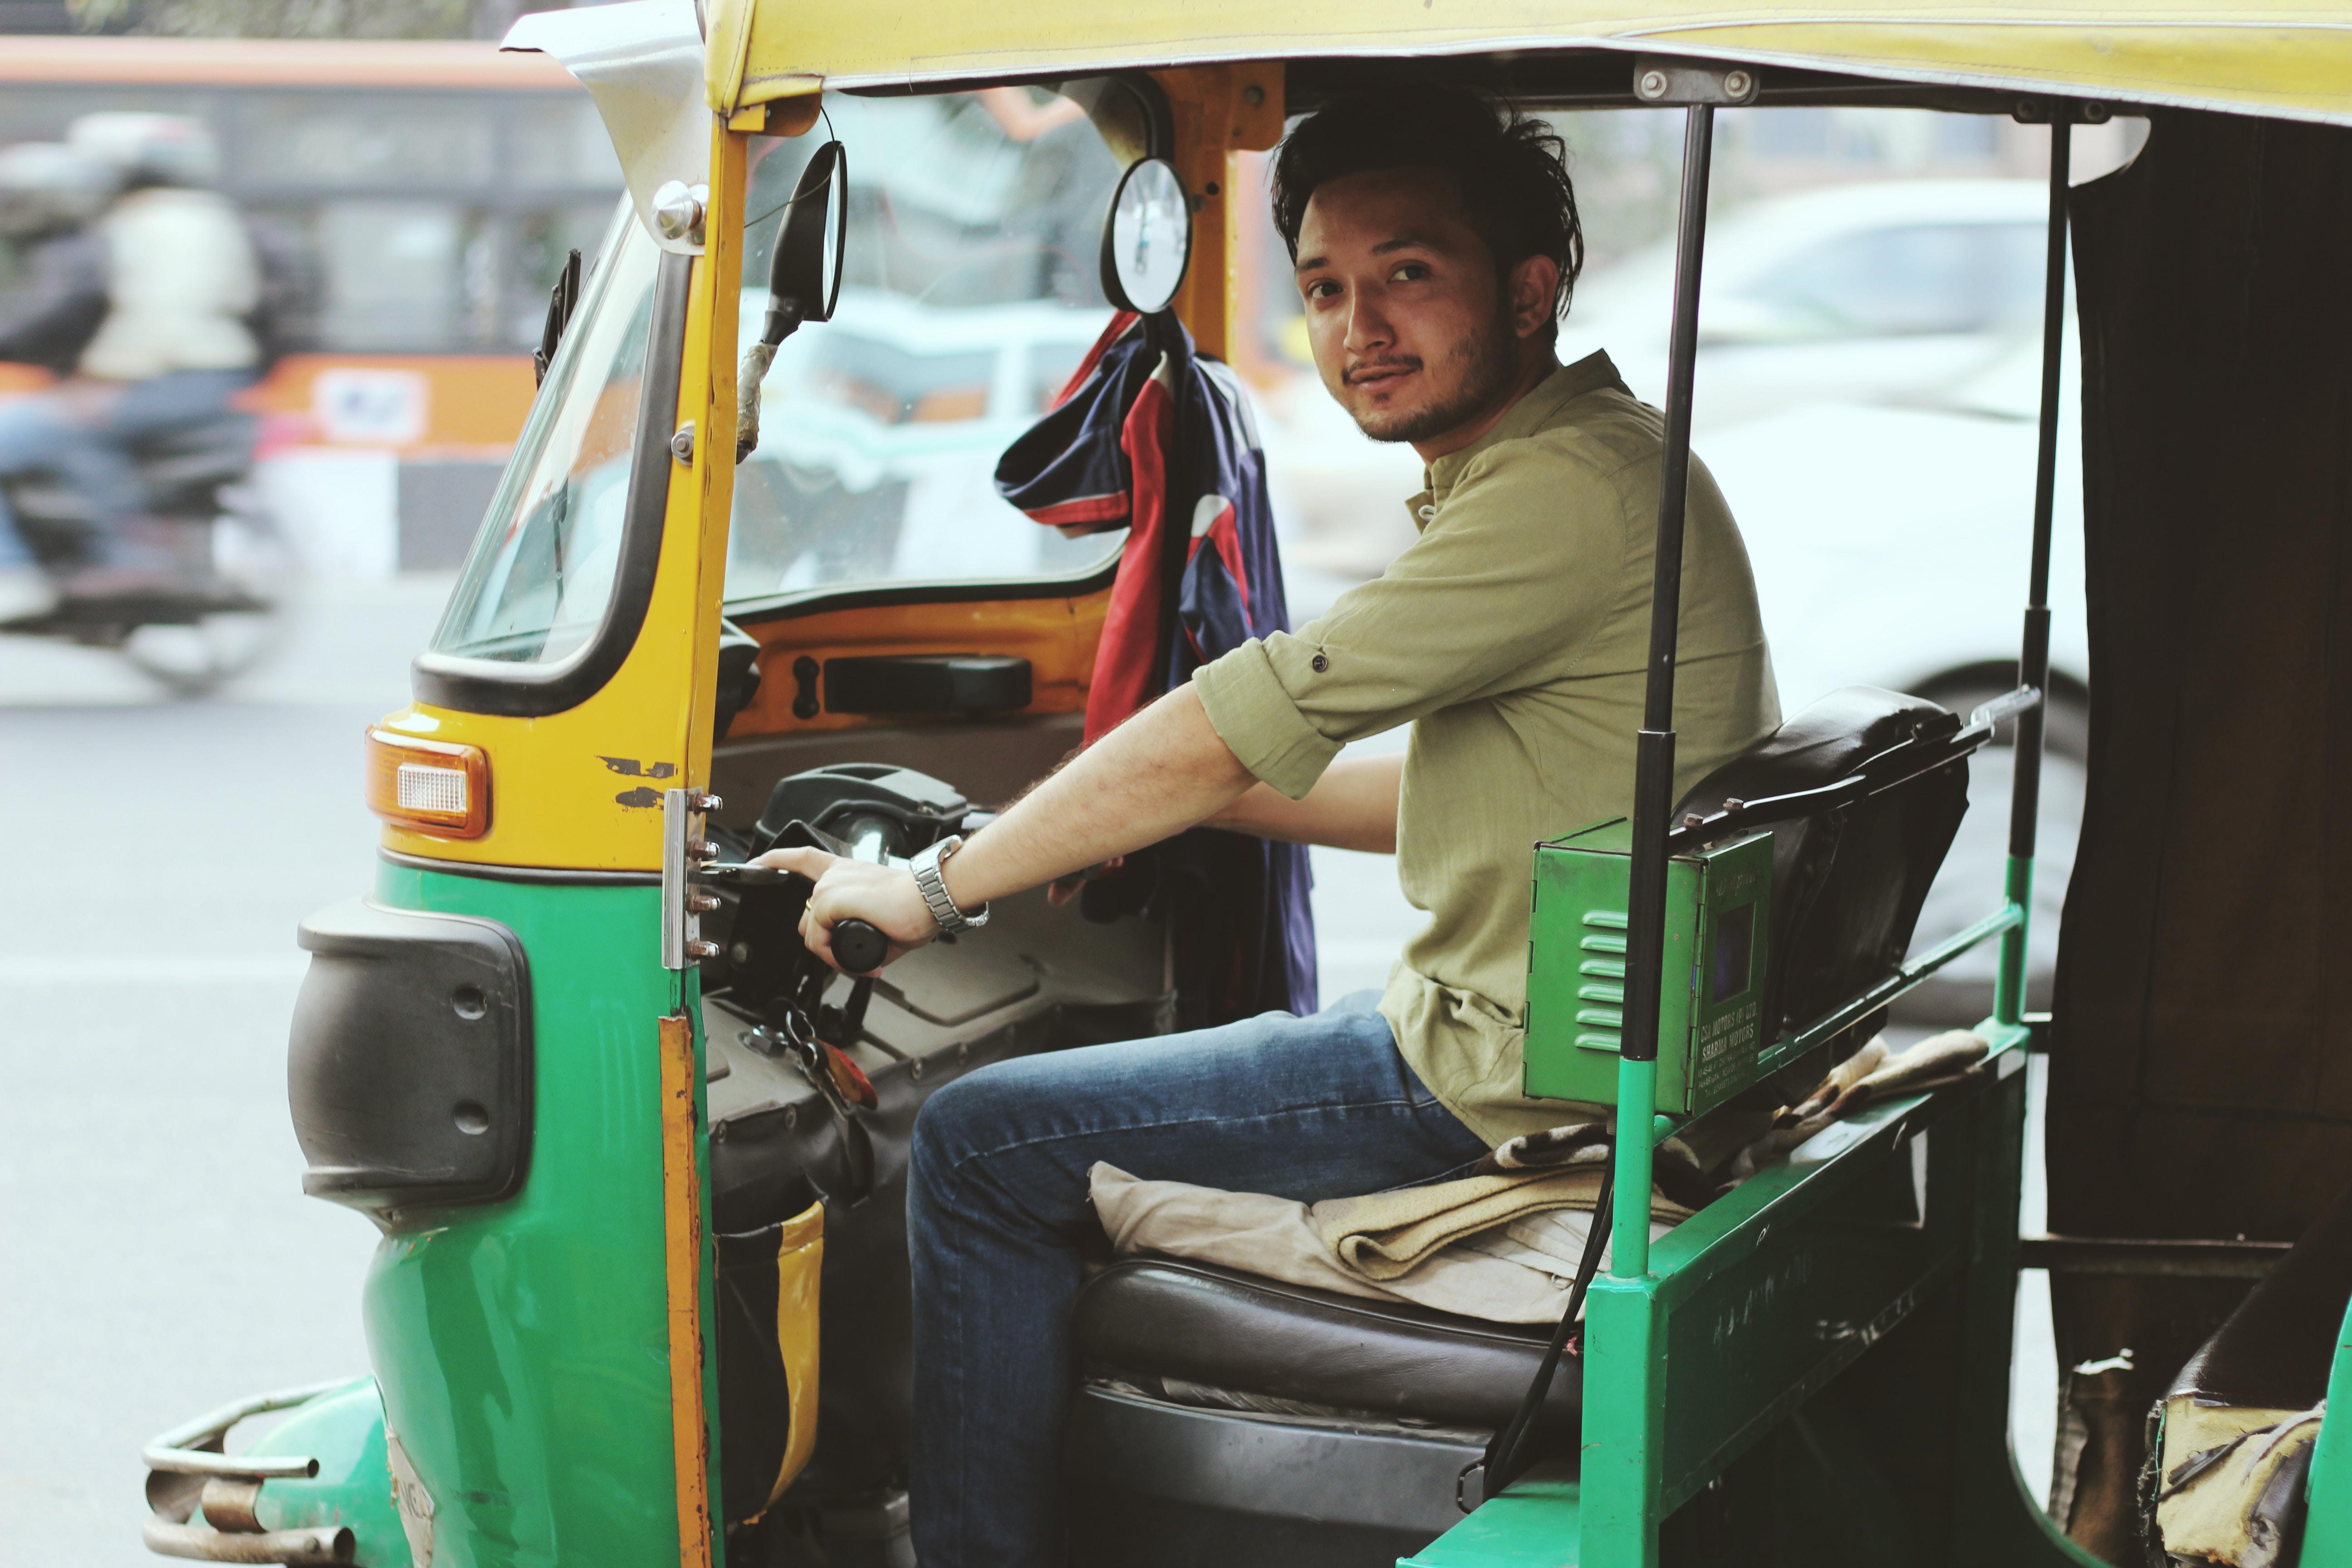 man riding on auto rickshaw